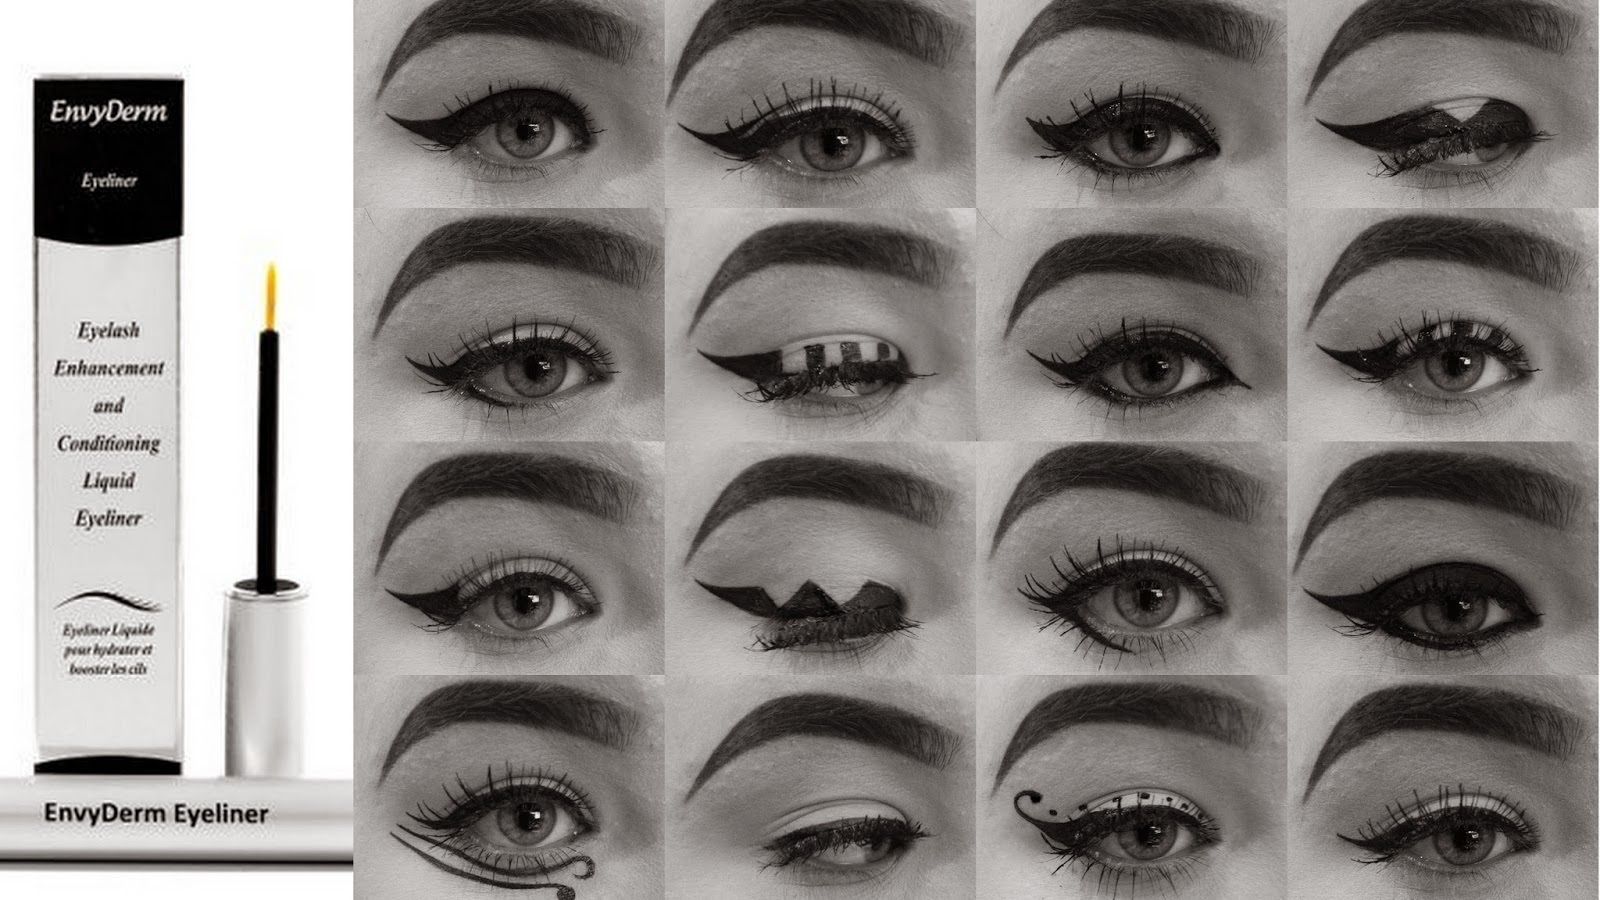 http://www.envyderm.com/envyderm-black-liquid-eyeliner